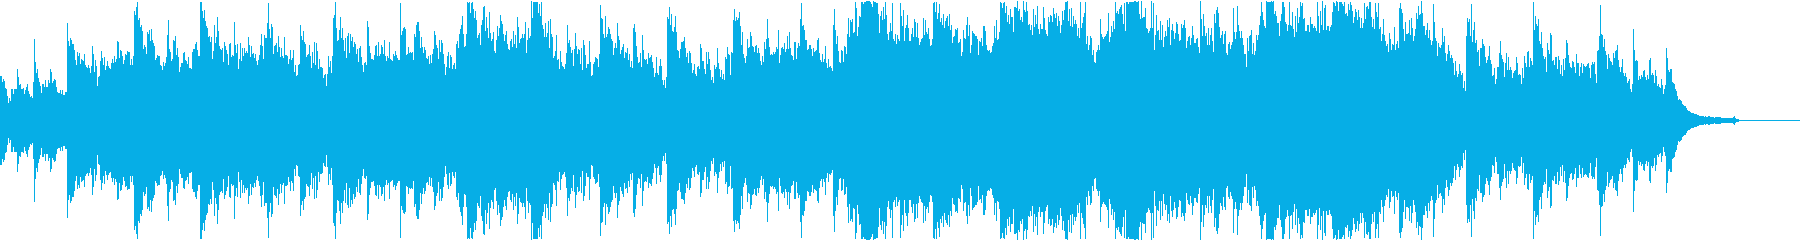 Blue Skyの再生済みの波形